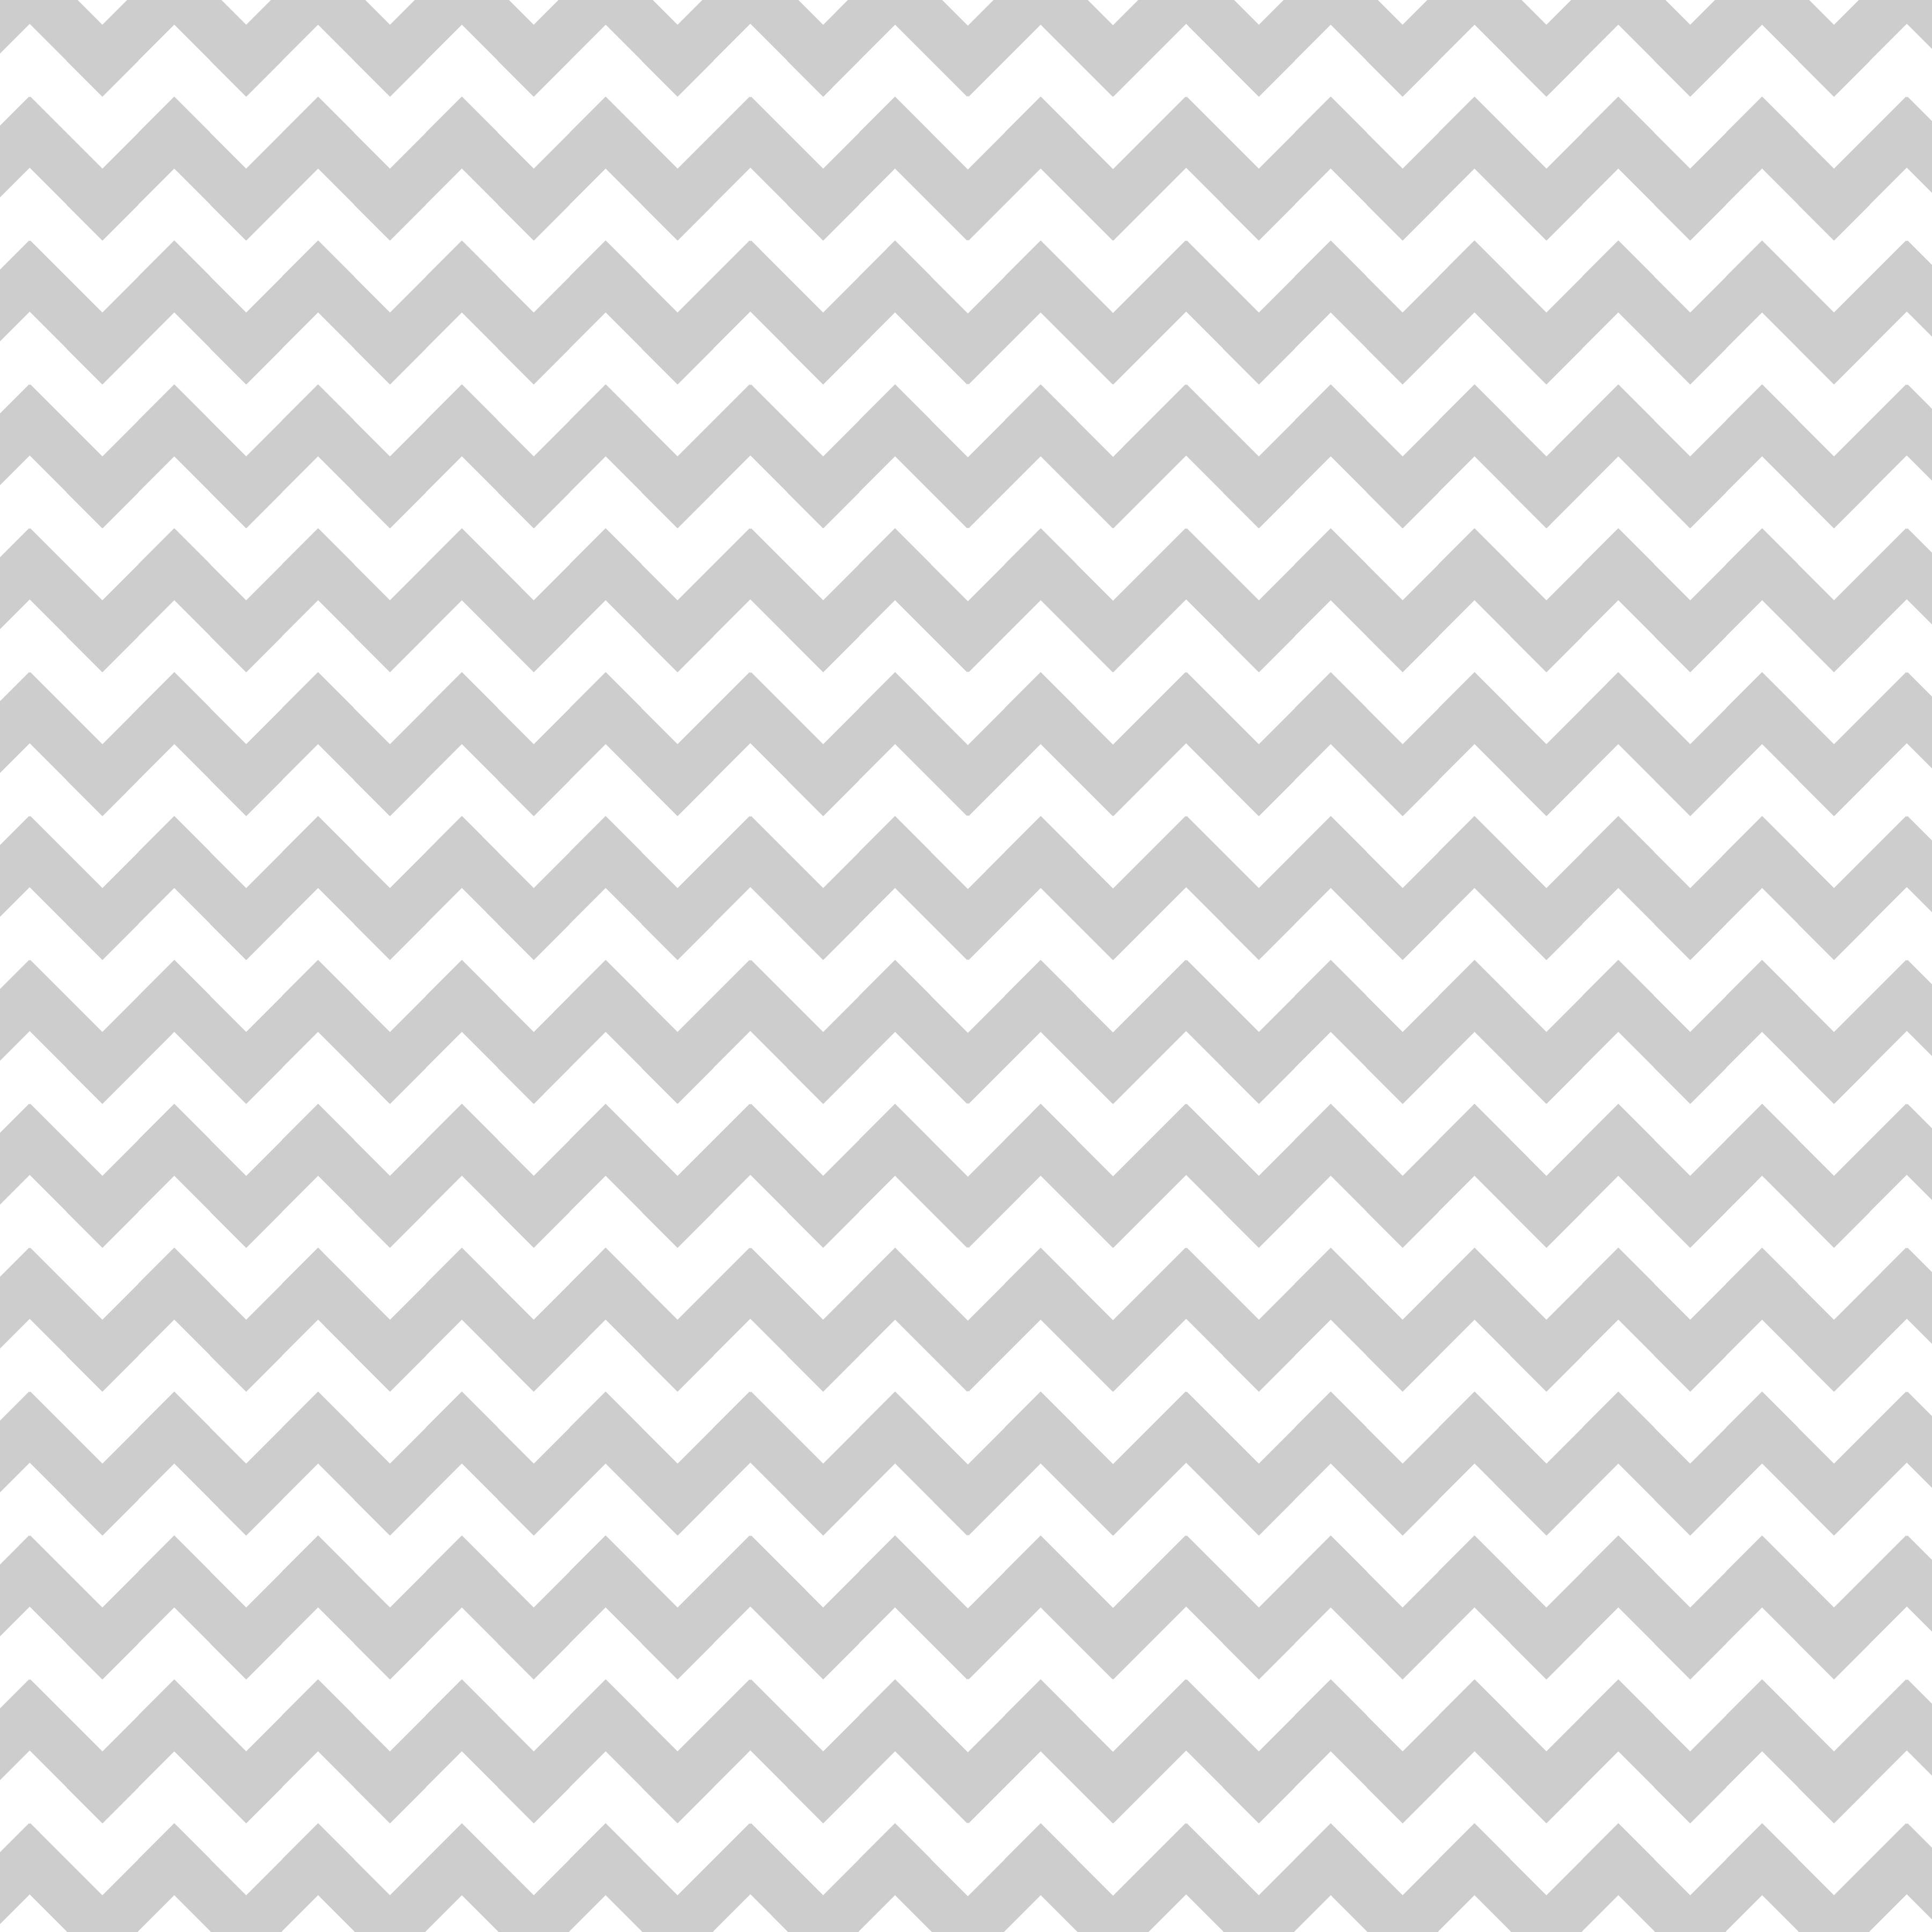 comwp contentuploads201301grey and white chevronjpg 3600x3600